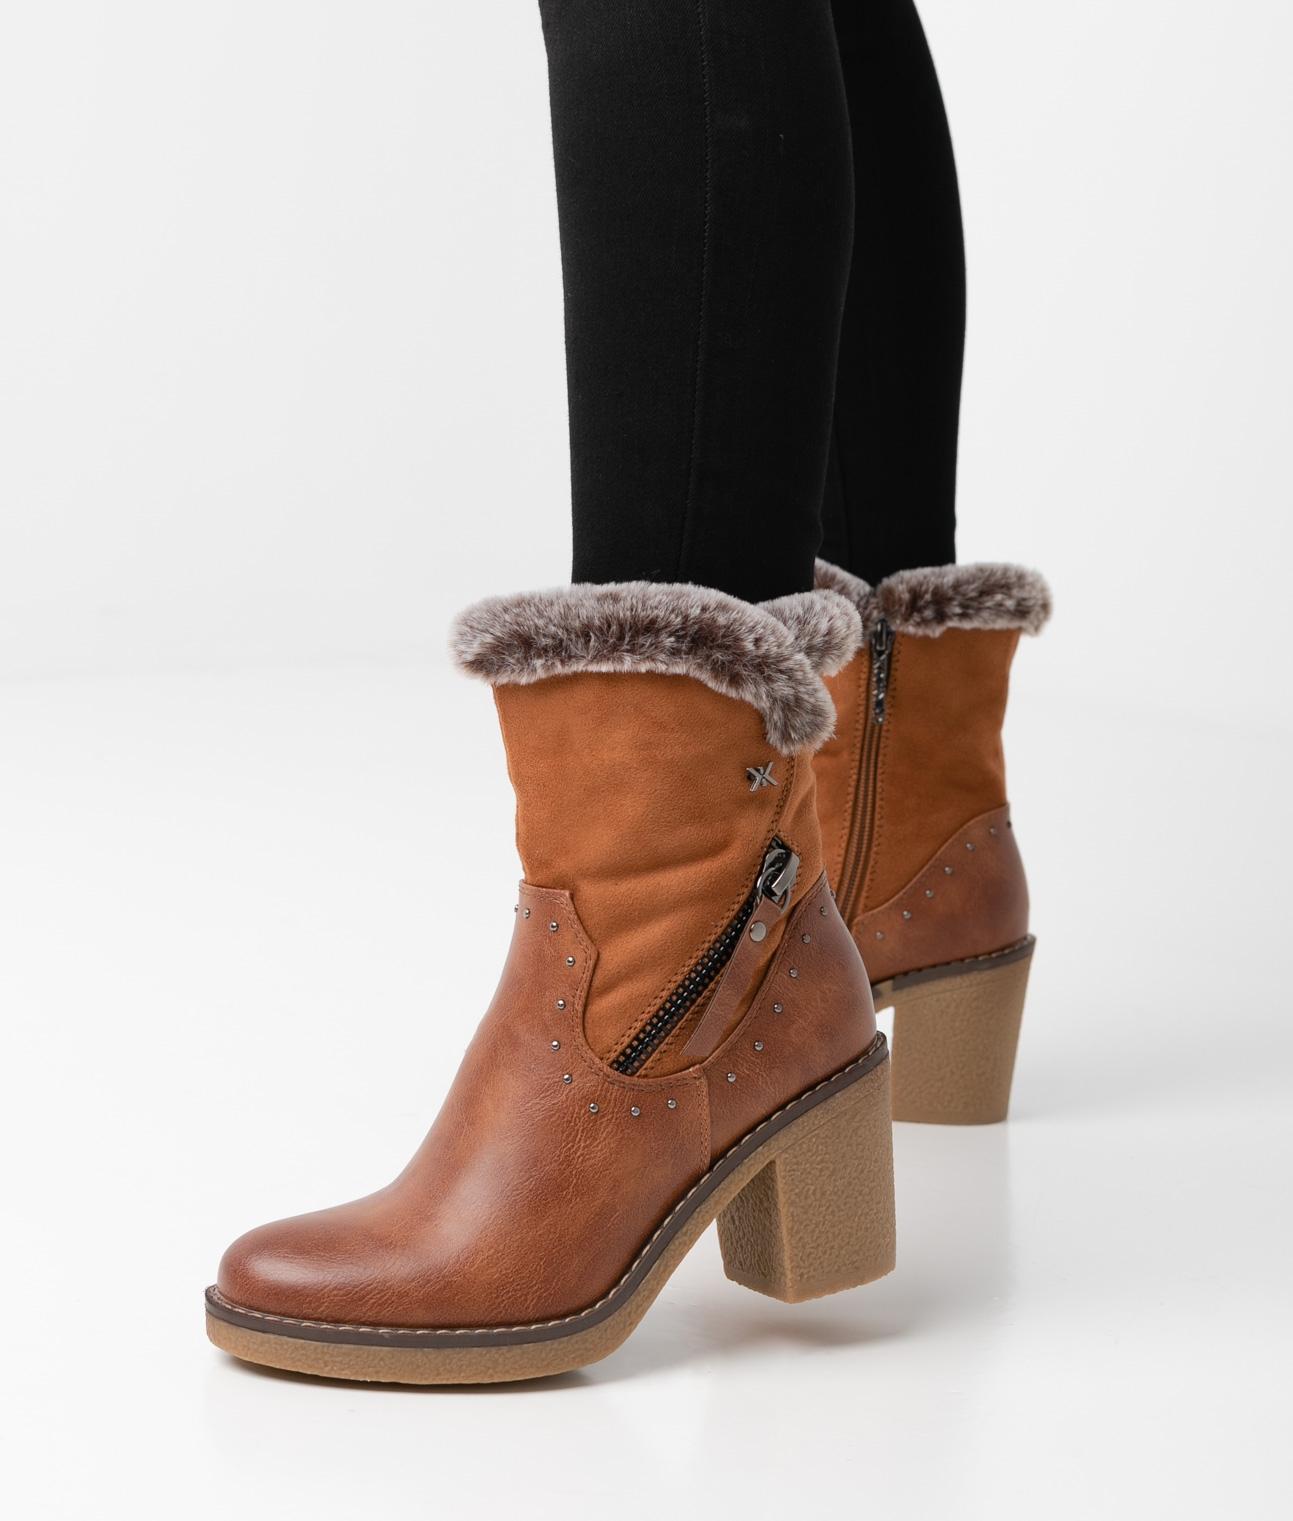 Taquira Boot - Camel